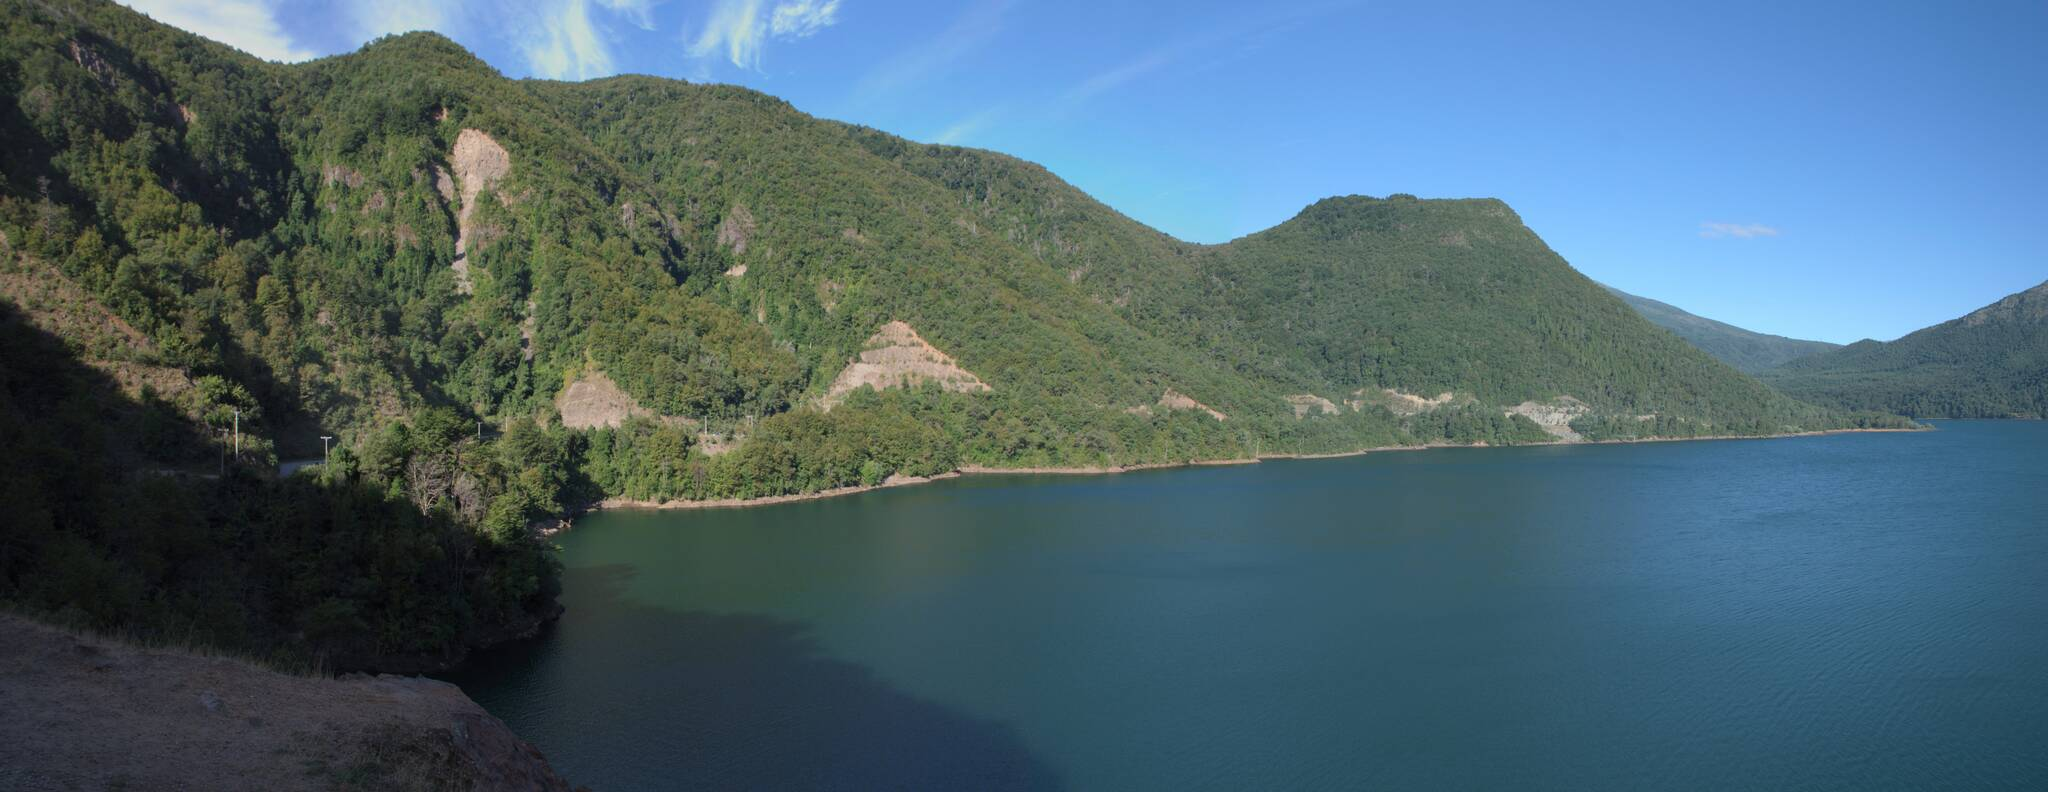 Kolejny zbiornik, jezioro Pangue